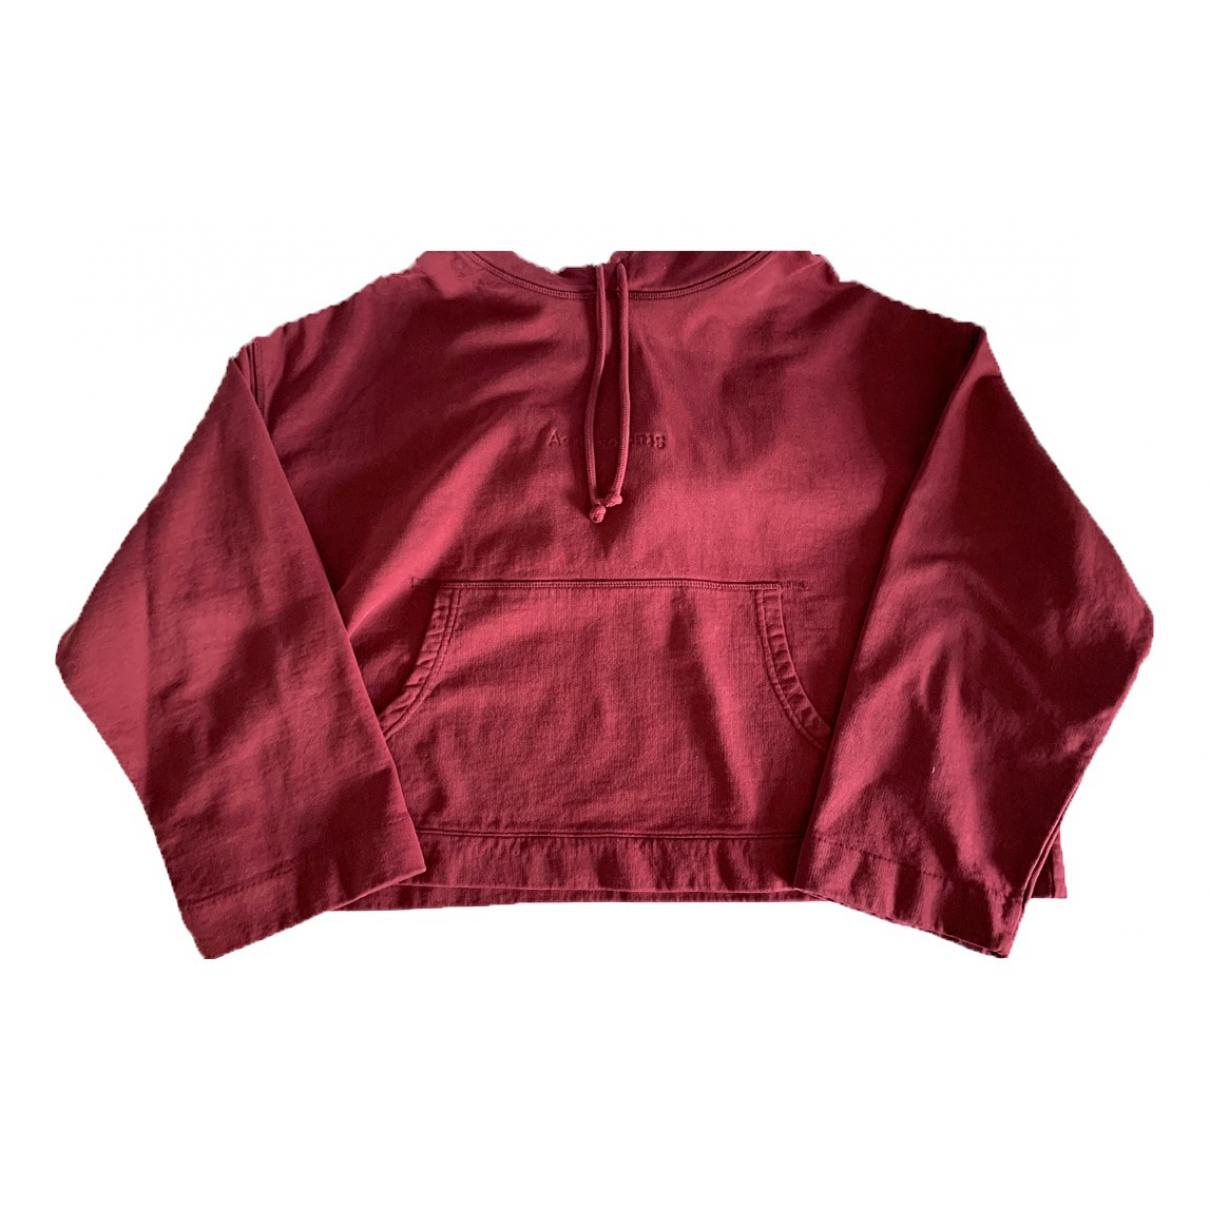 Acne Studios \N Burgundy Cotton Knitwear for Women XS International